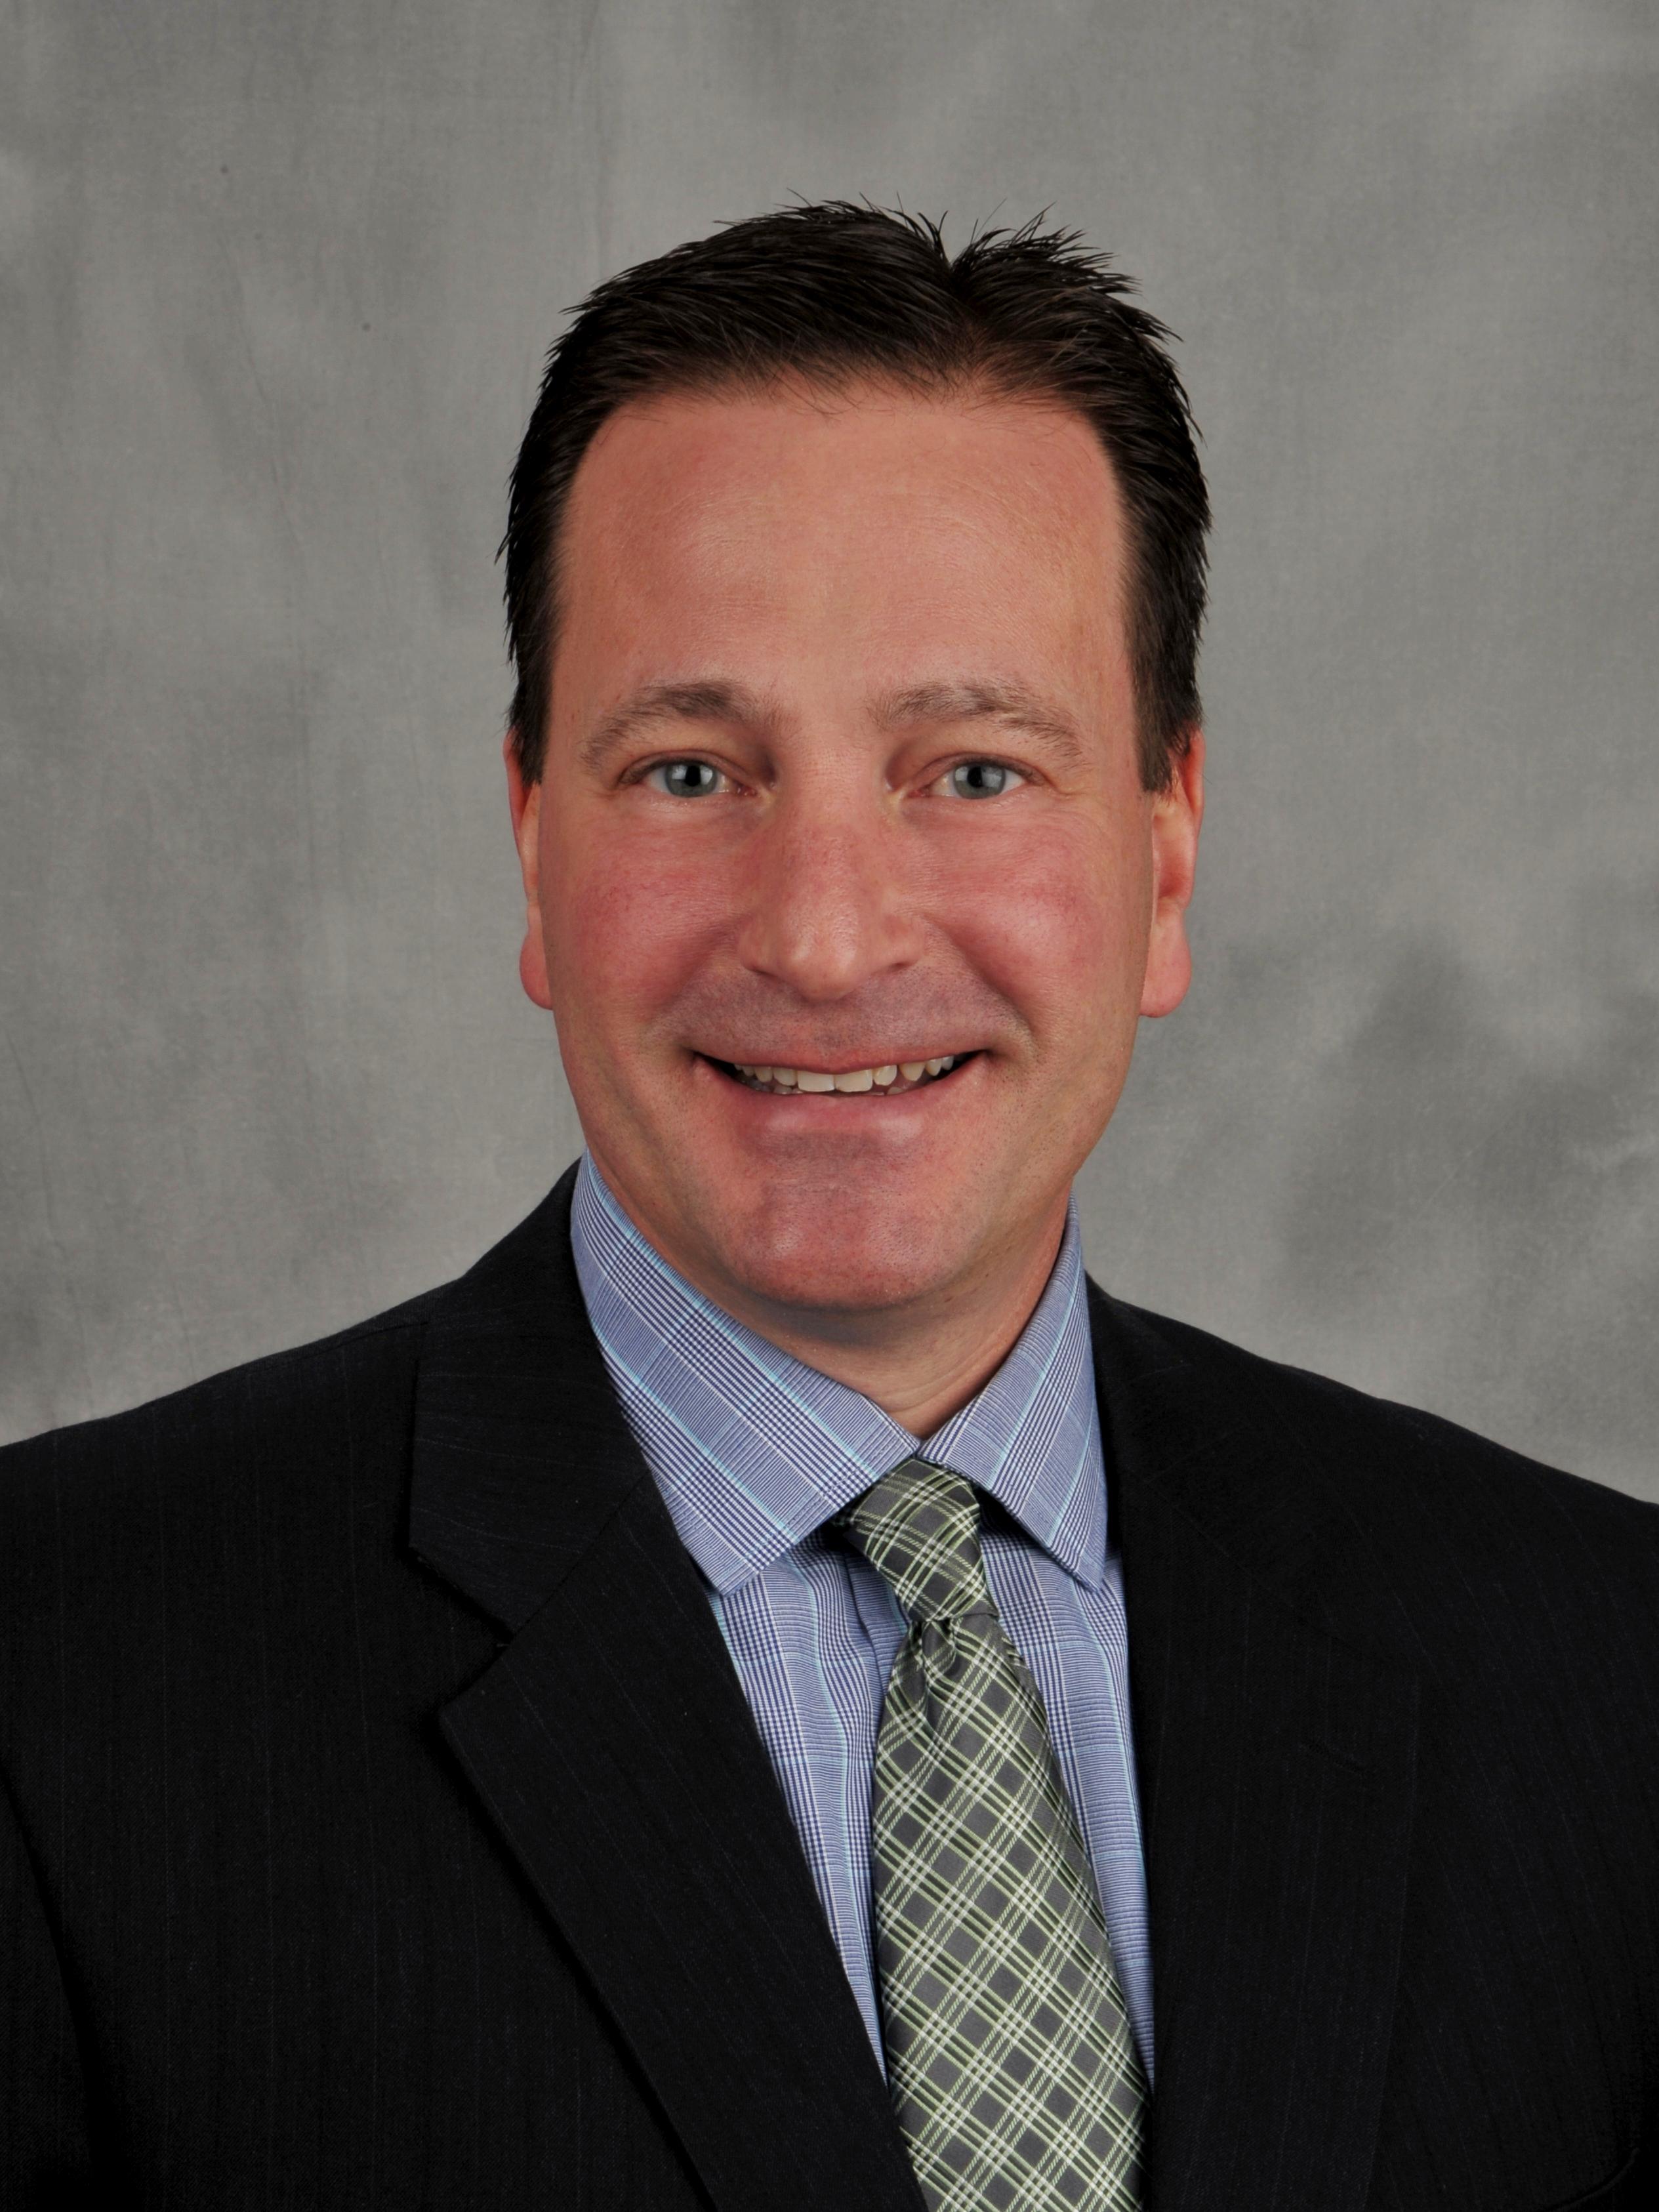 Steven Luebke. Photo courtesy of North Shore Bank.